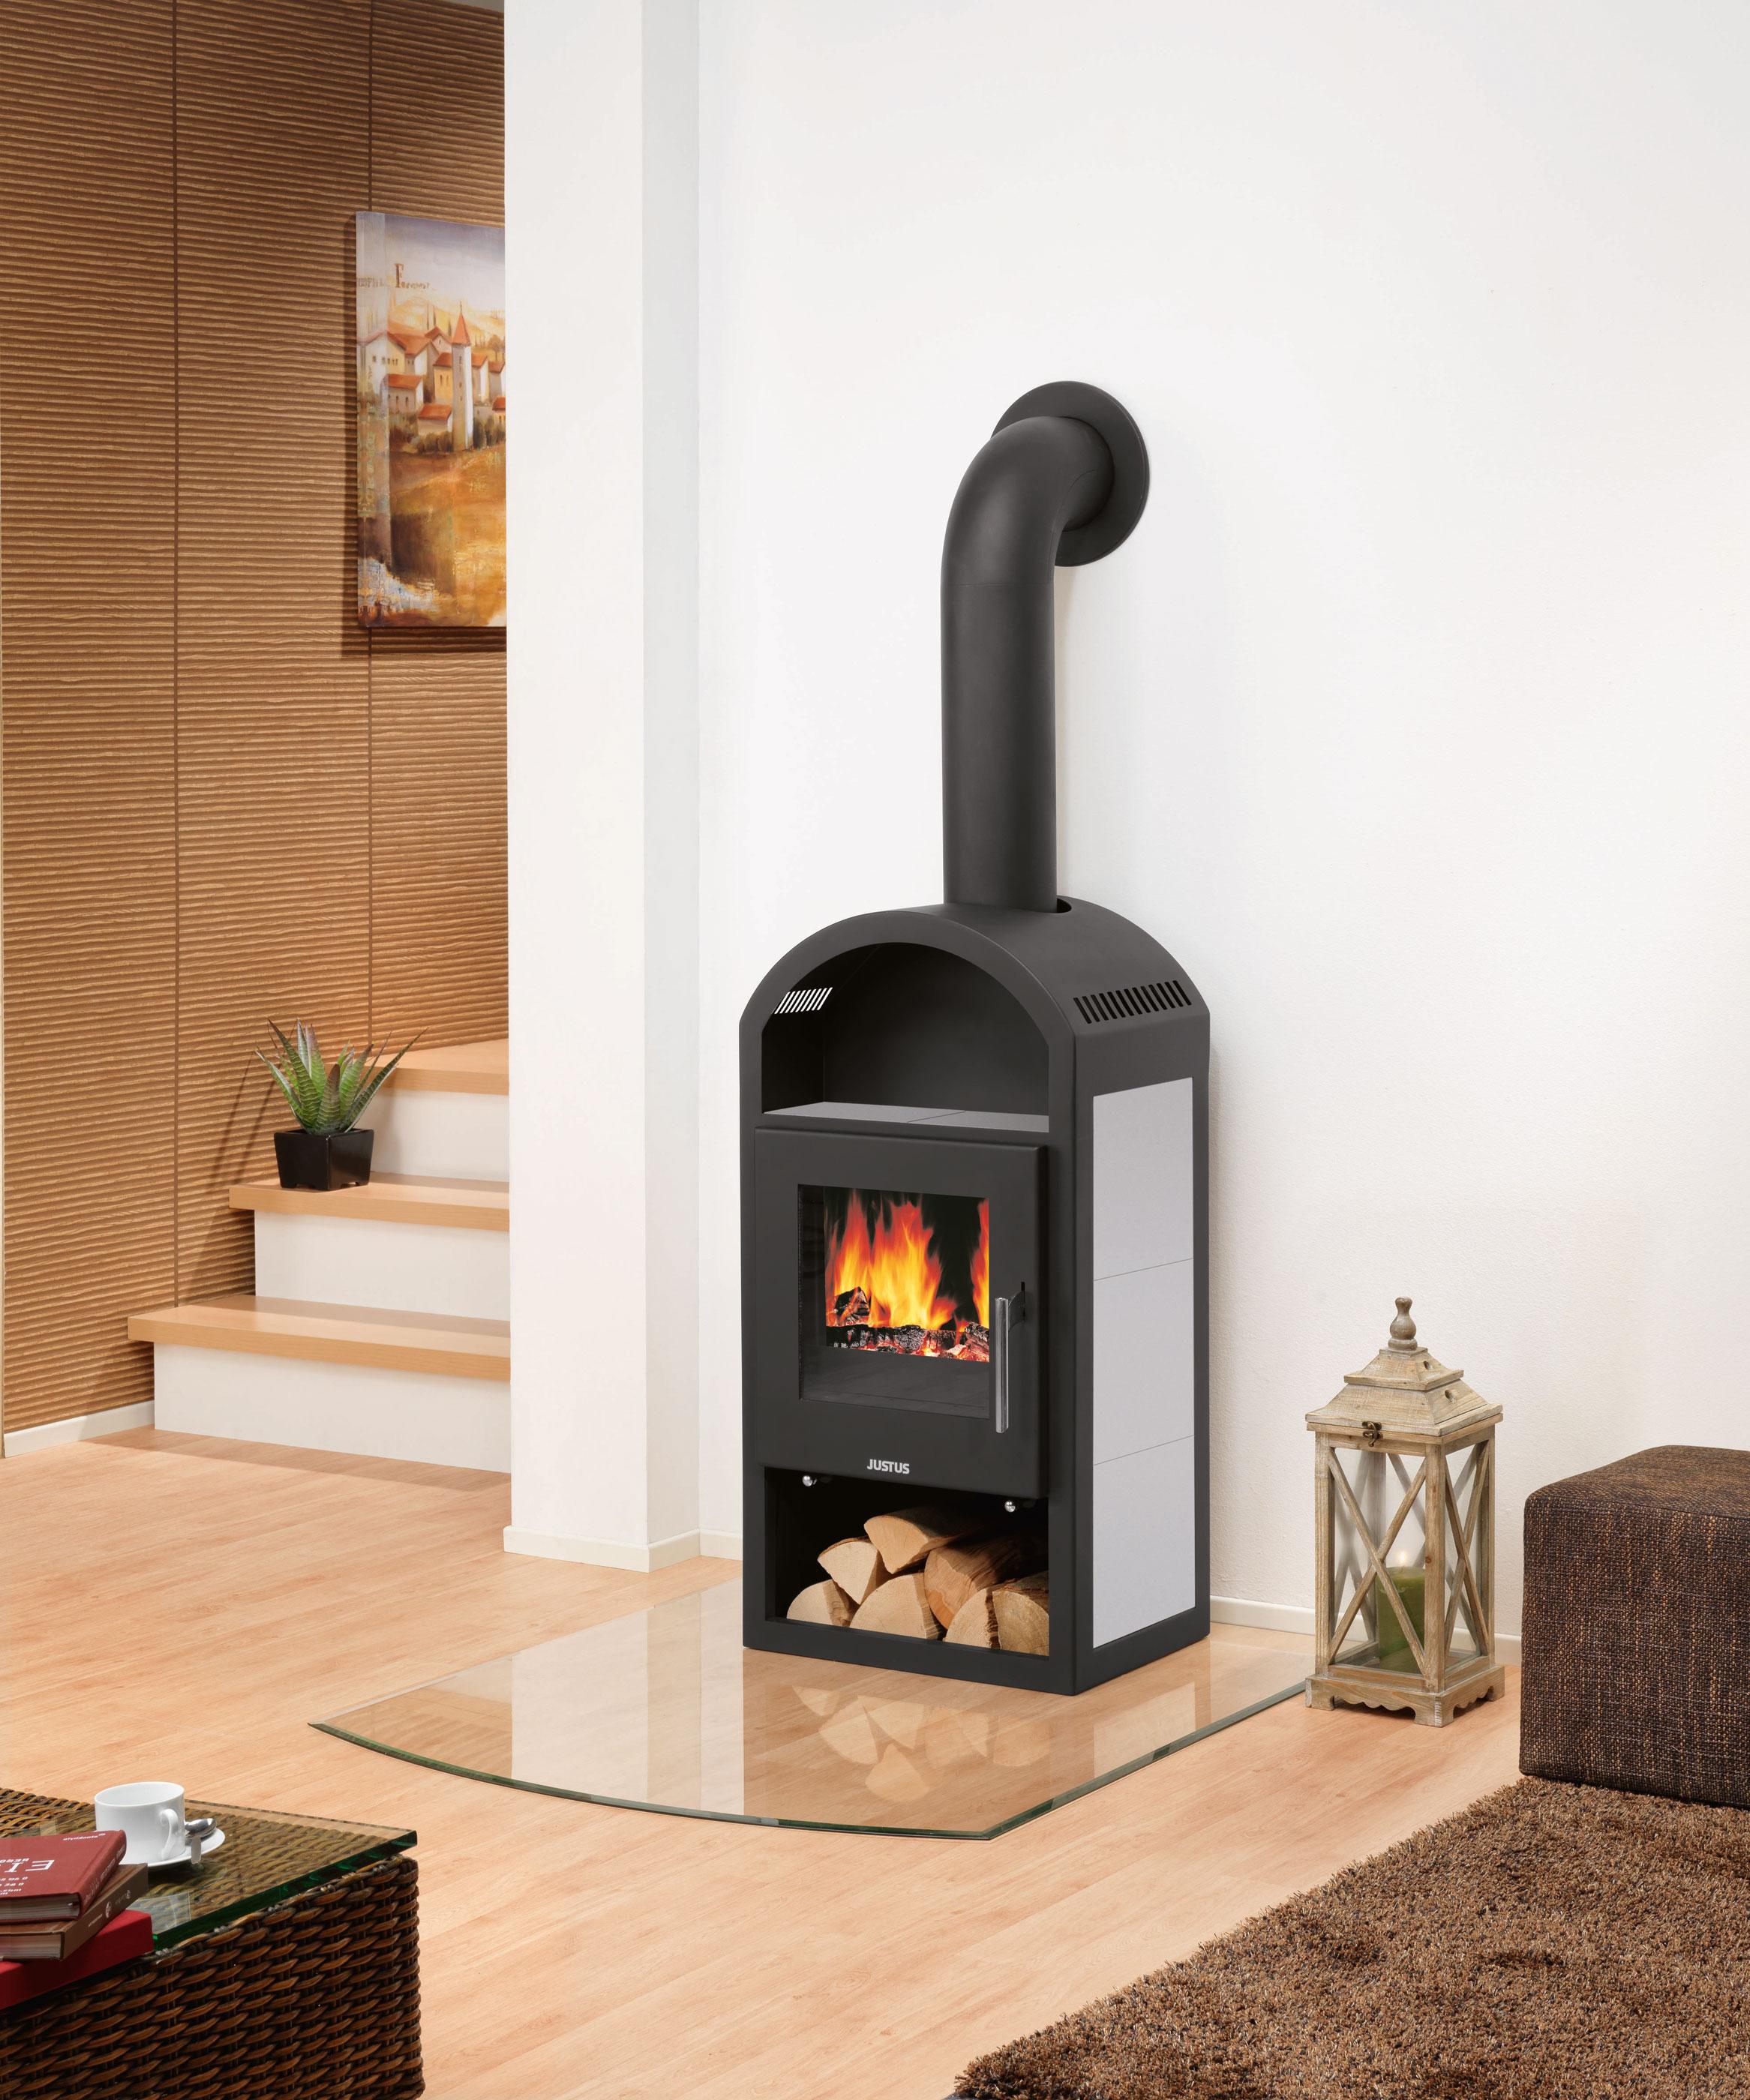 kaminofen justus vegas keramik grau 6kw bei. Black Bedroom Furniture Sets. Home Design Ideas